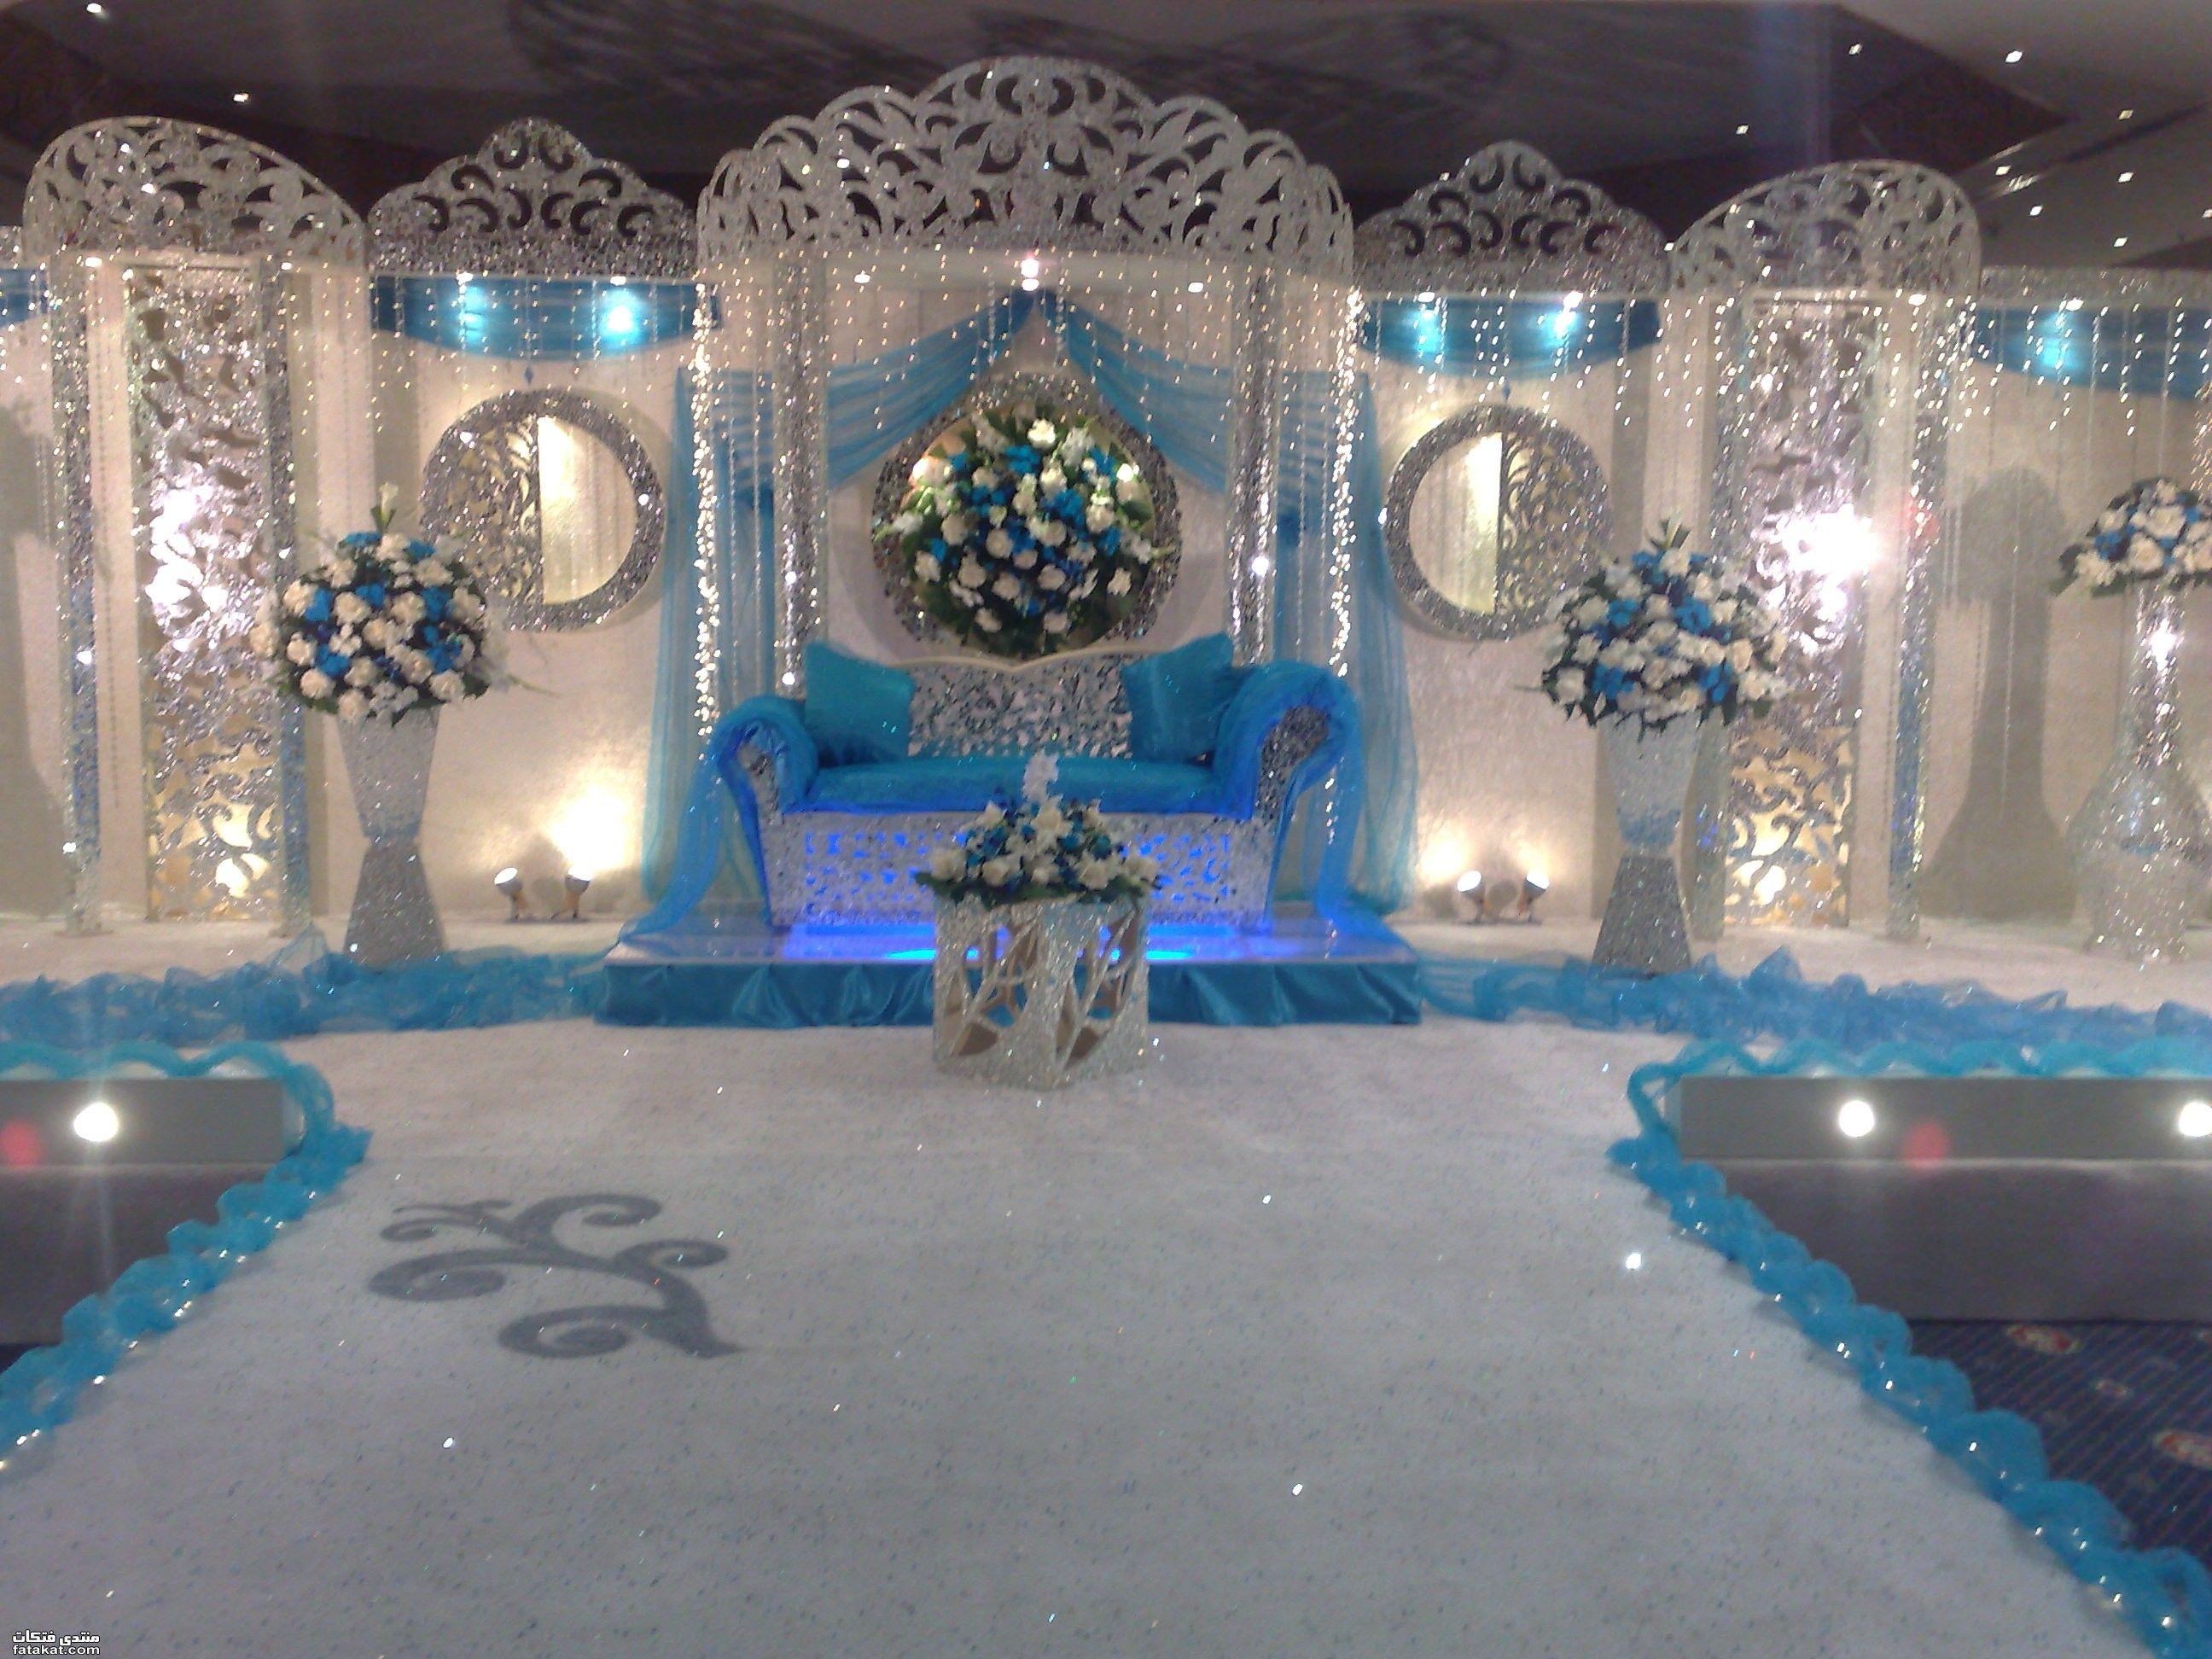 Cheap centerpieces for wedding receptions decorations for Cheap wedding venue decoration ideas